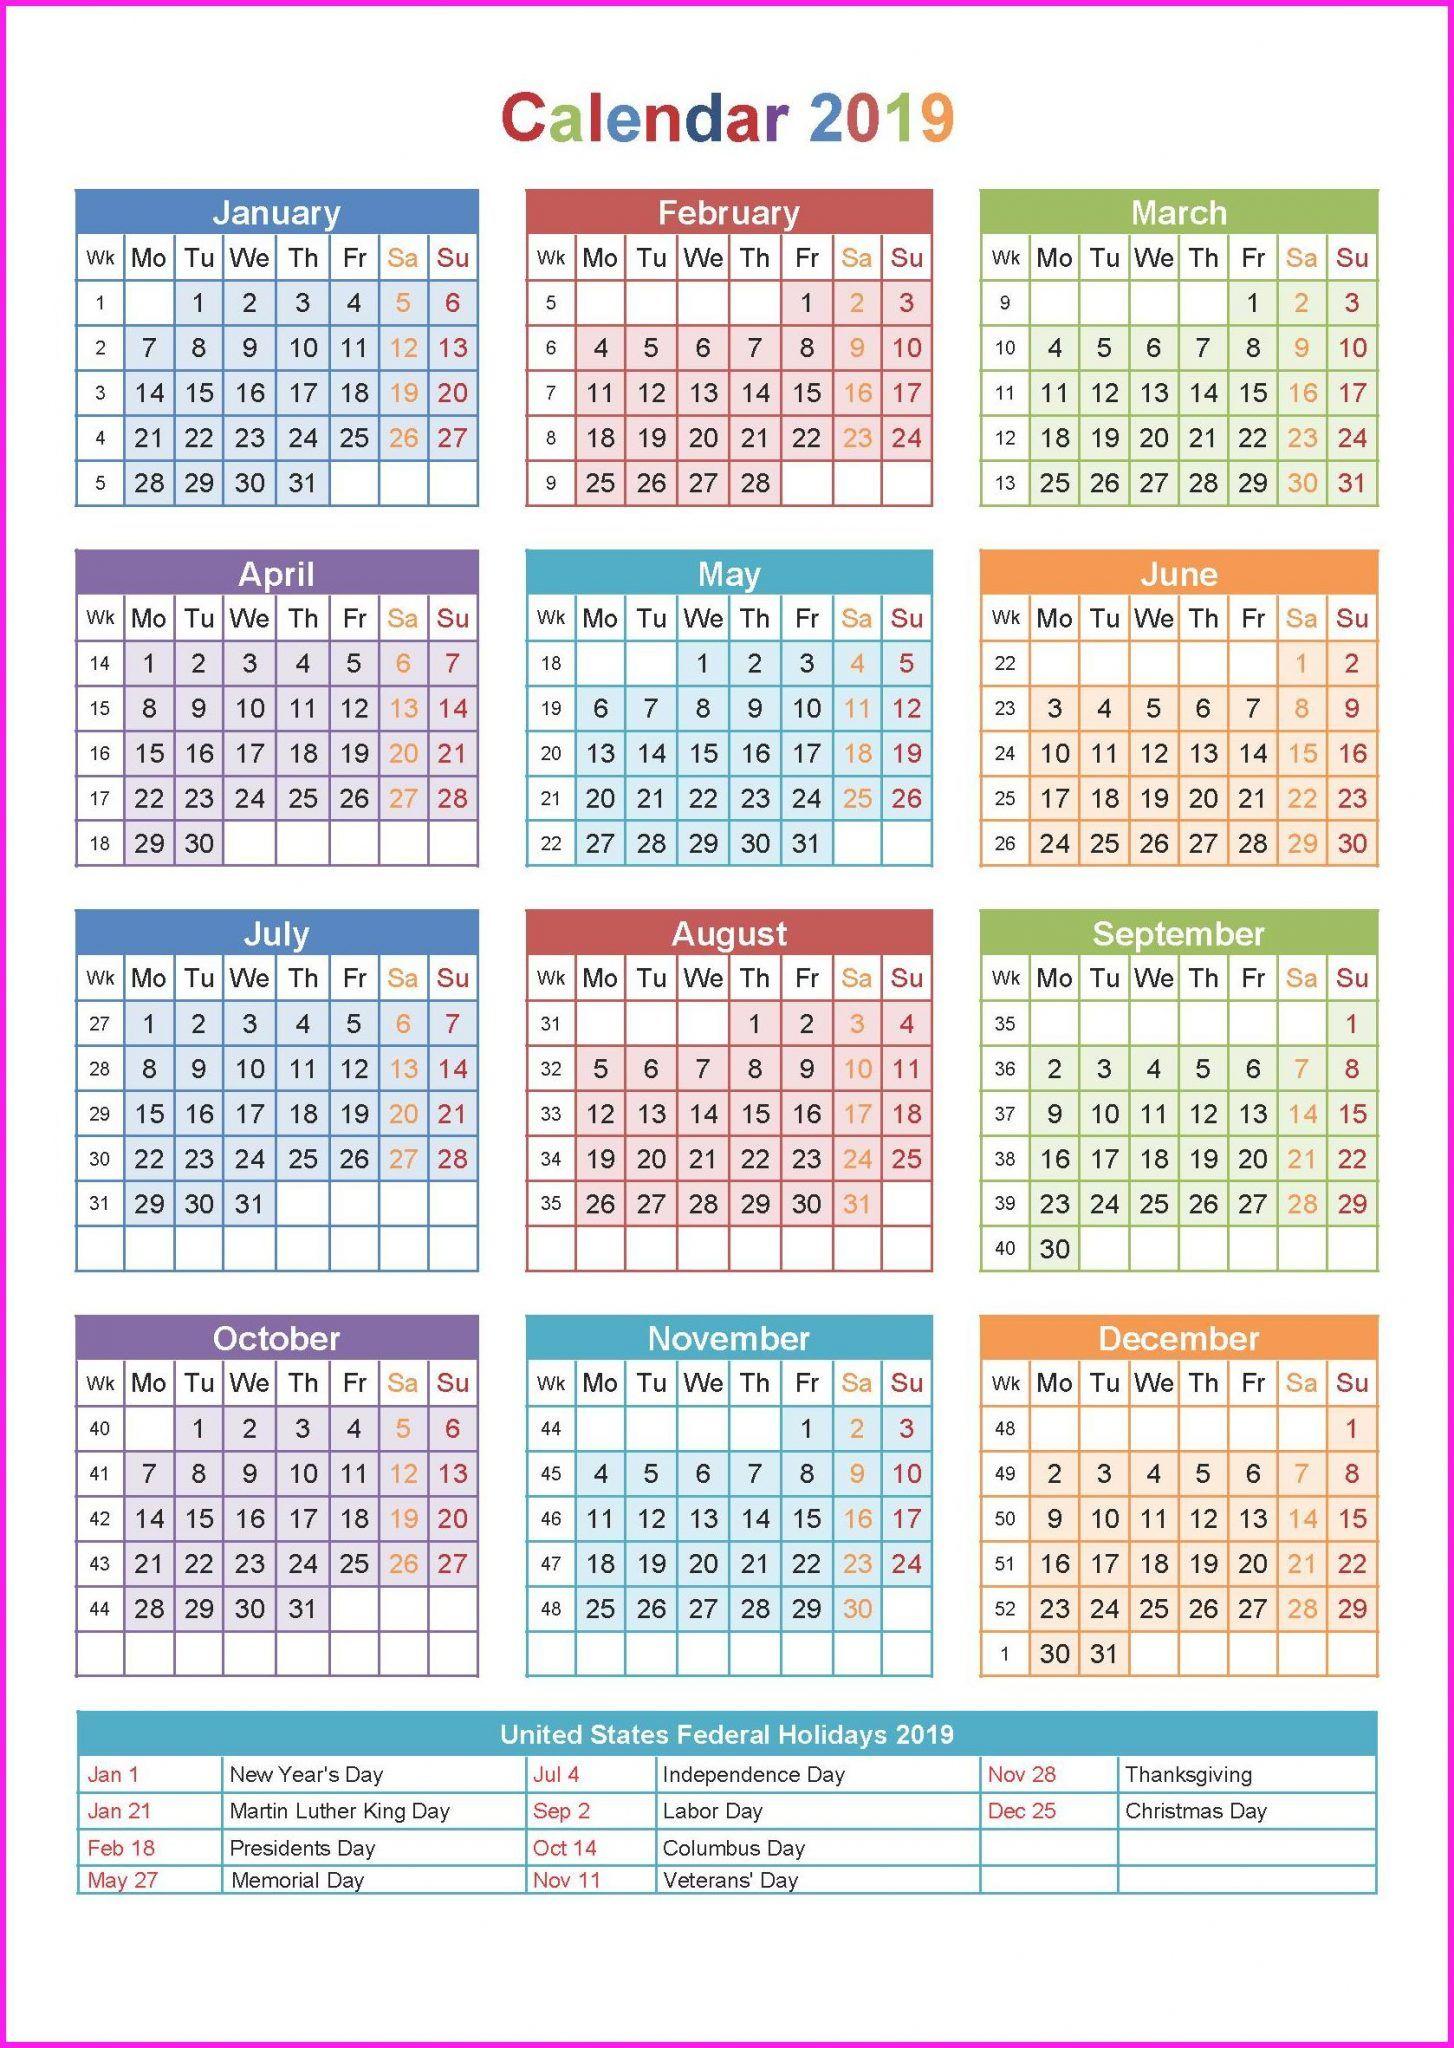 Yearly 2019 Calendar Printable | Top 10 Free 2019 Calendar